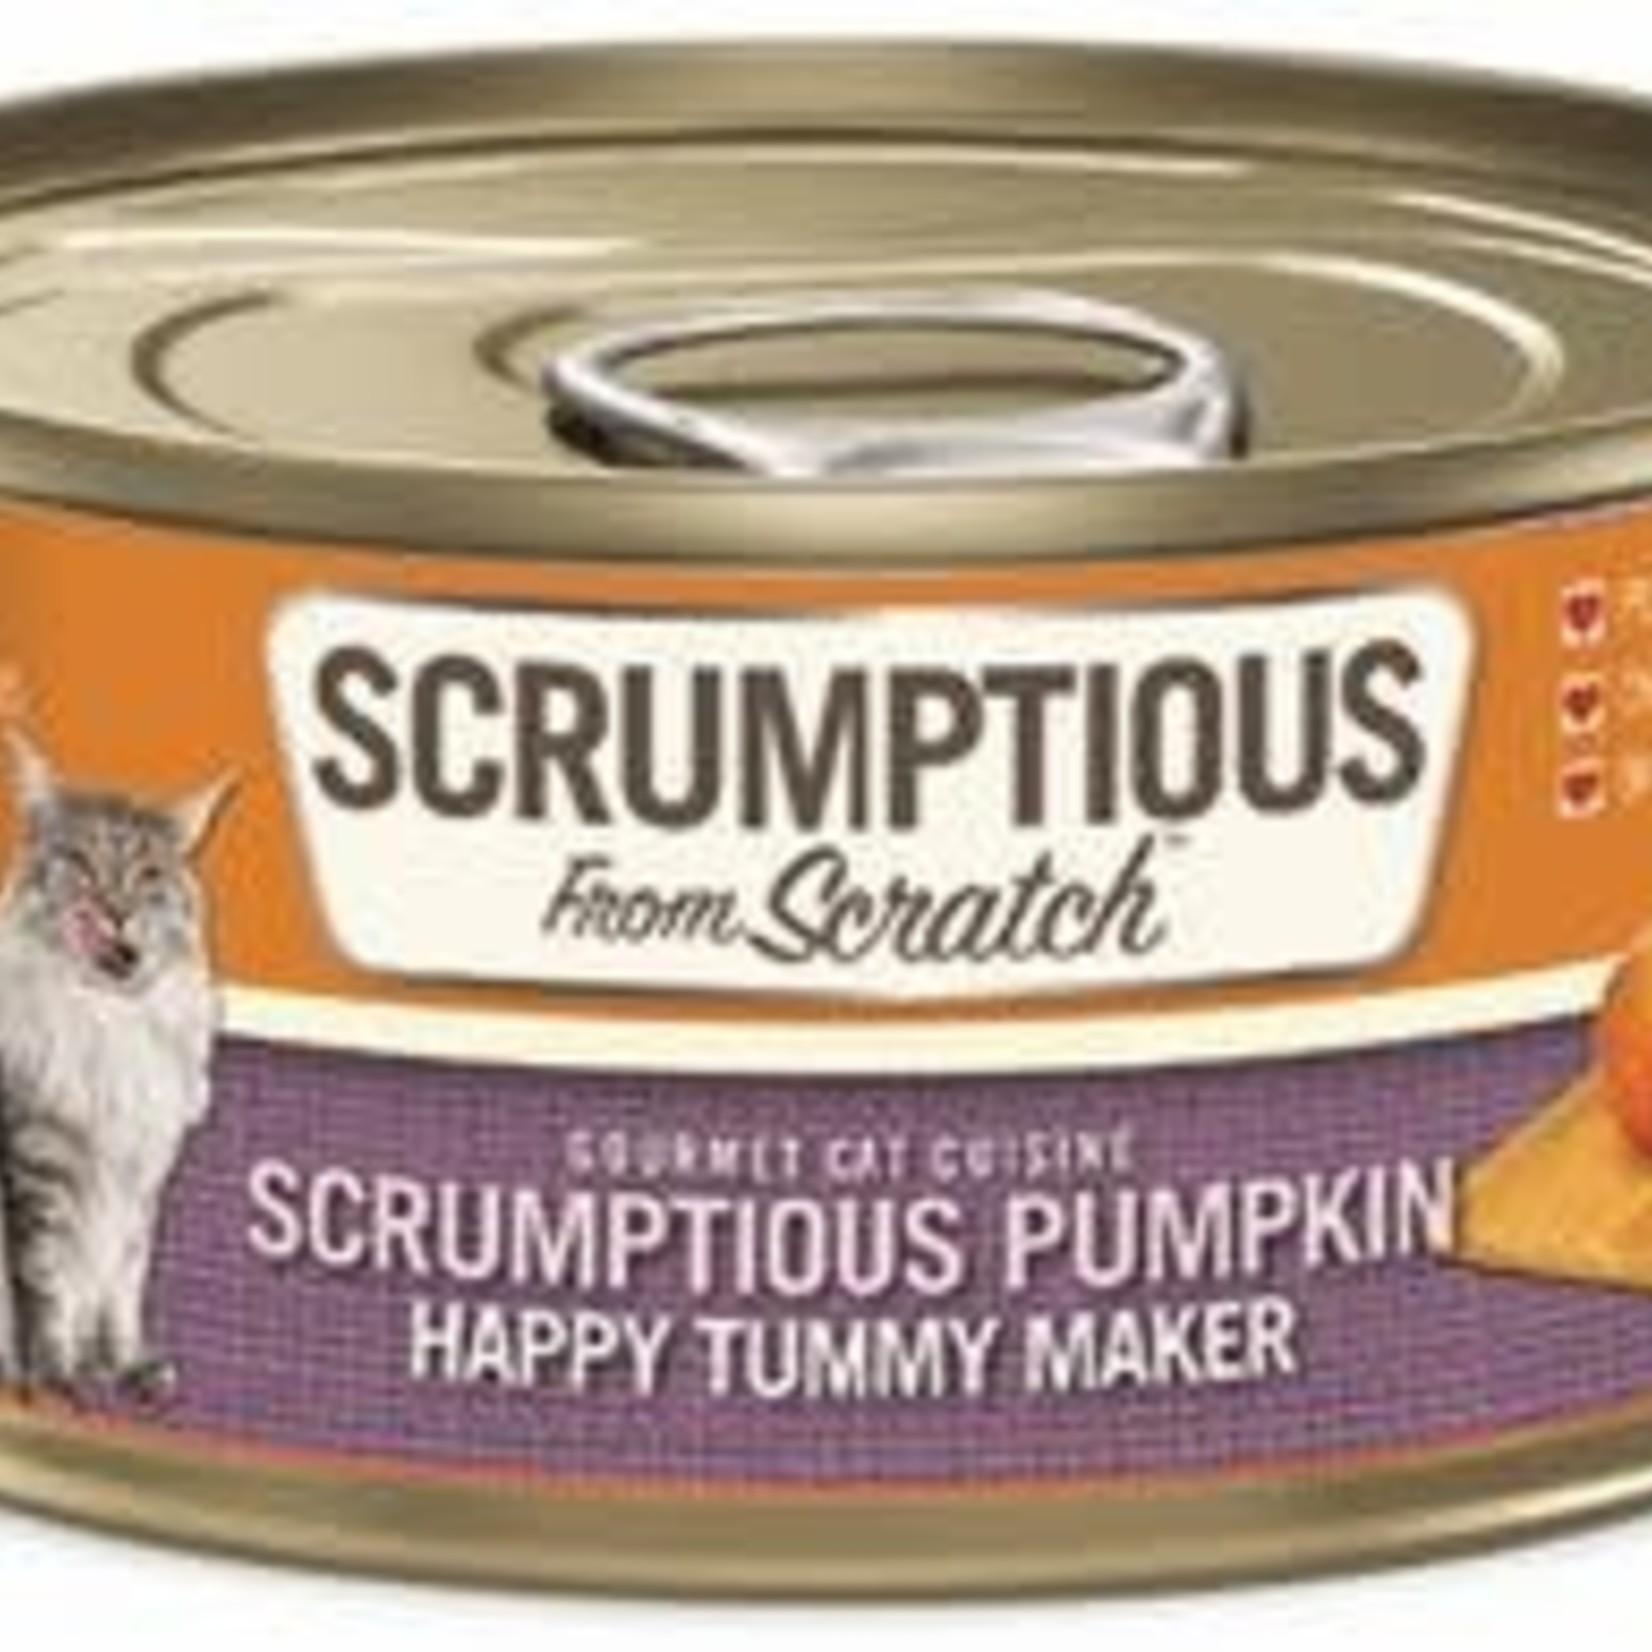 Scrumptious Scrumptious Pumpkin Puree 2.8 OZ